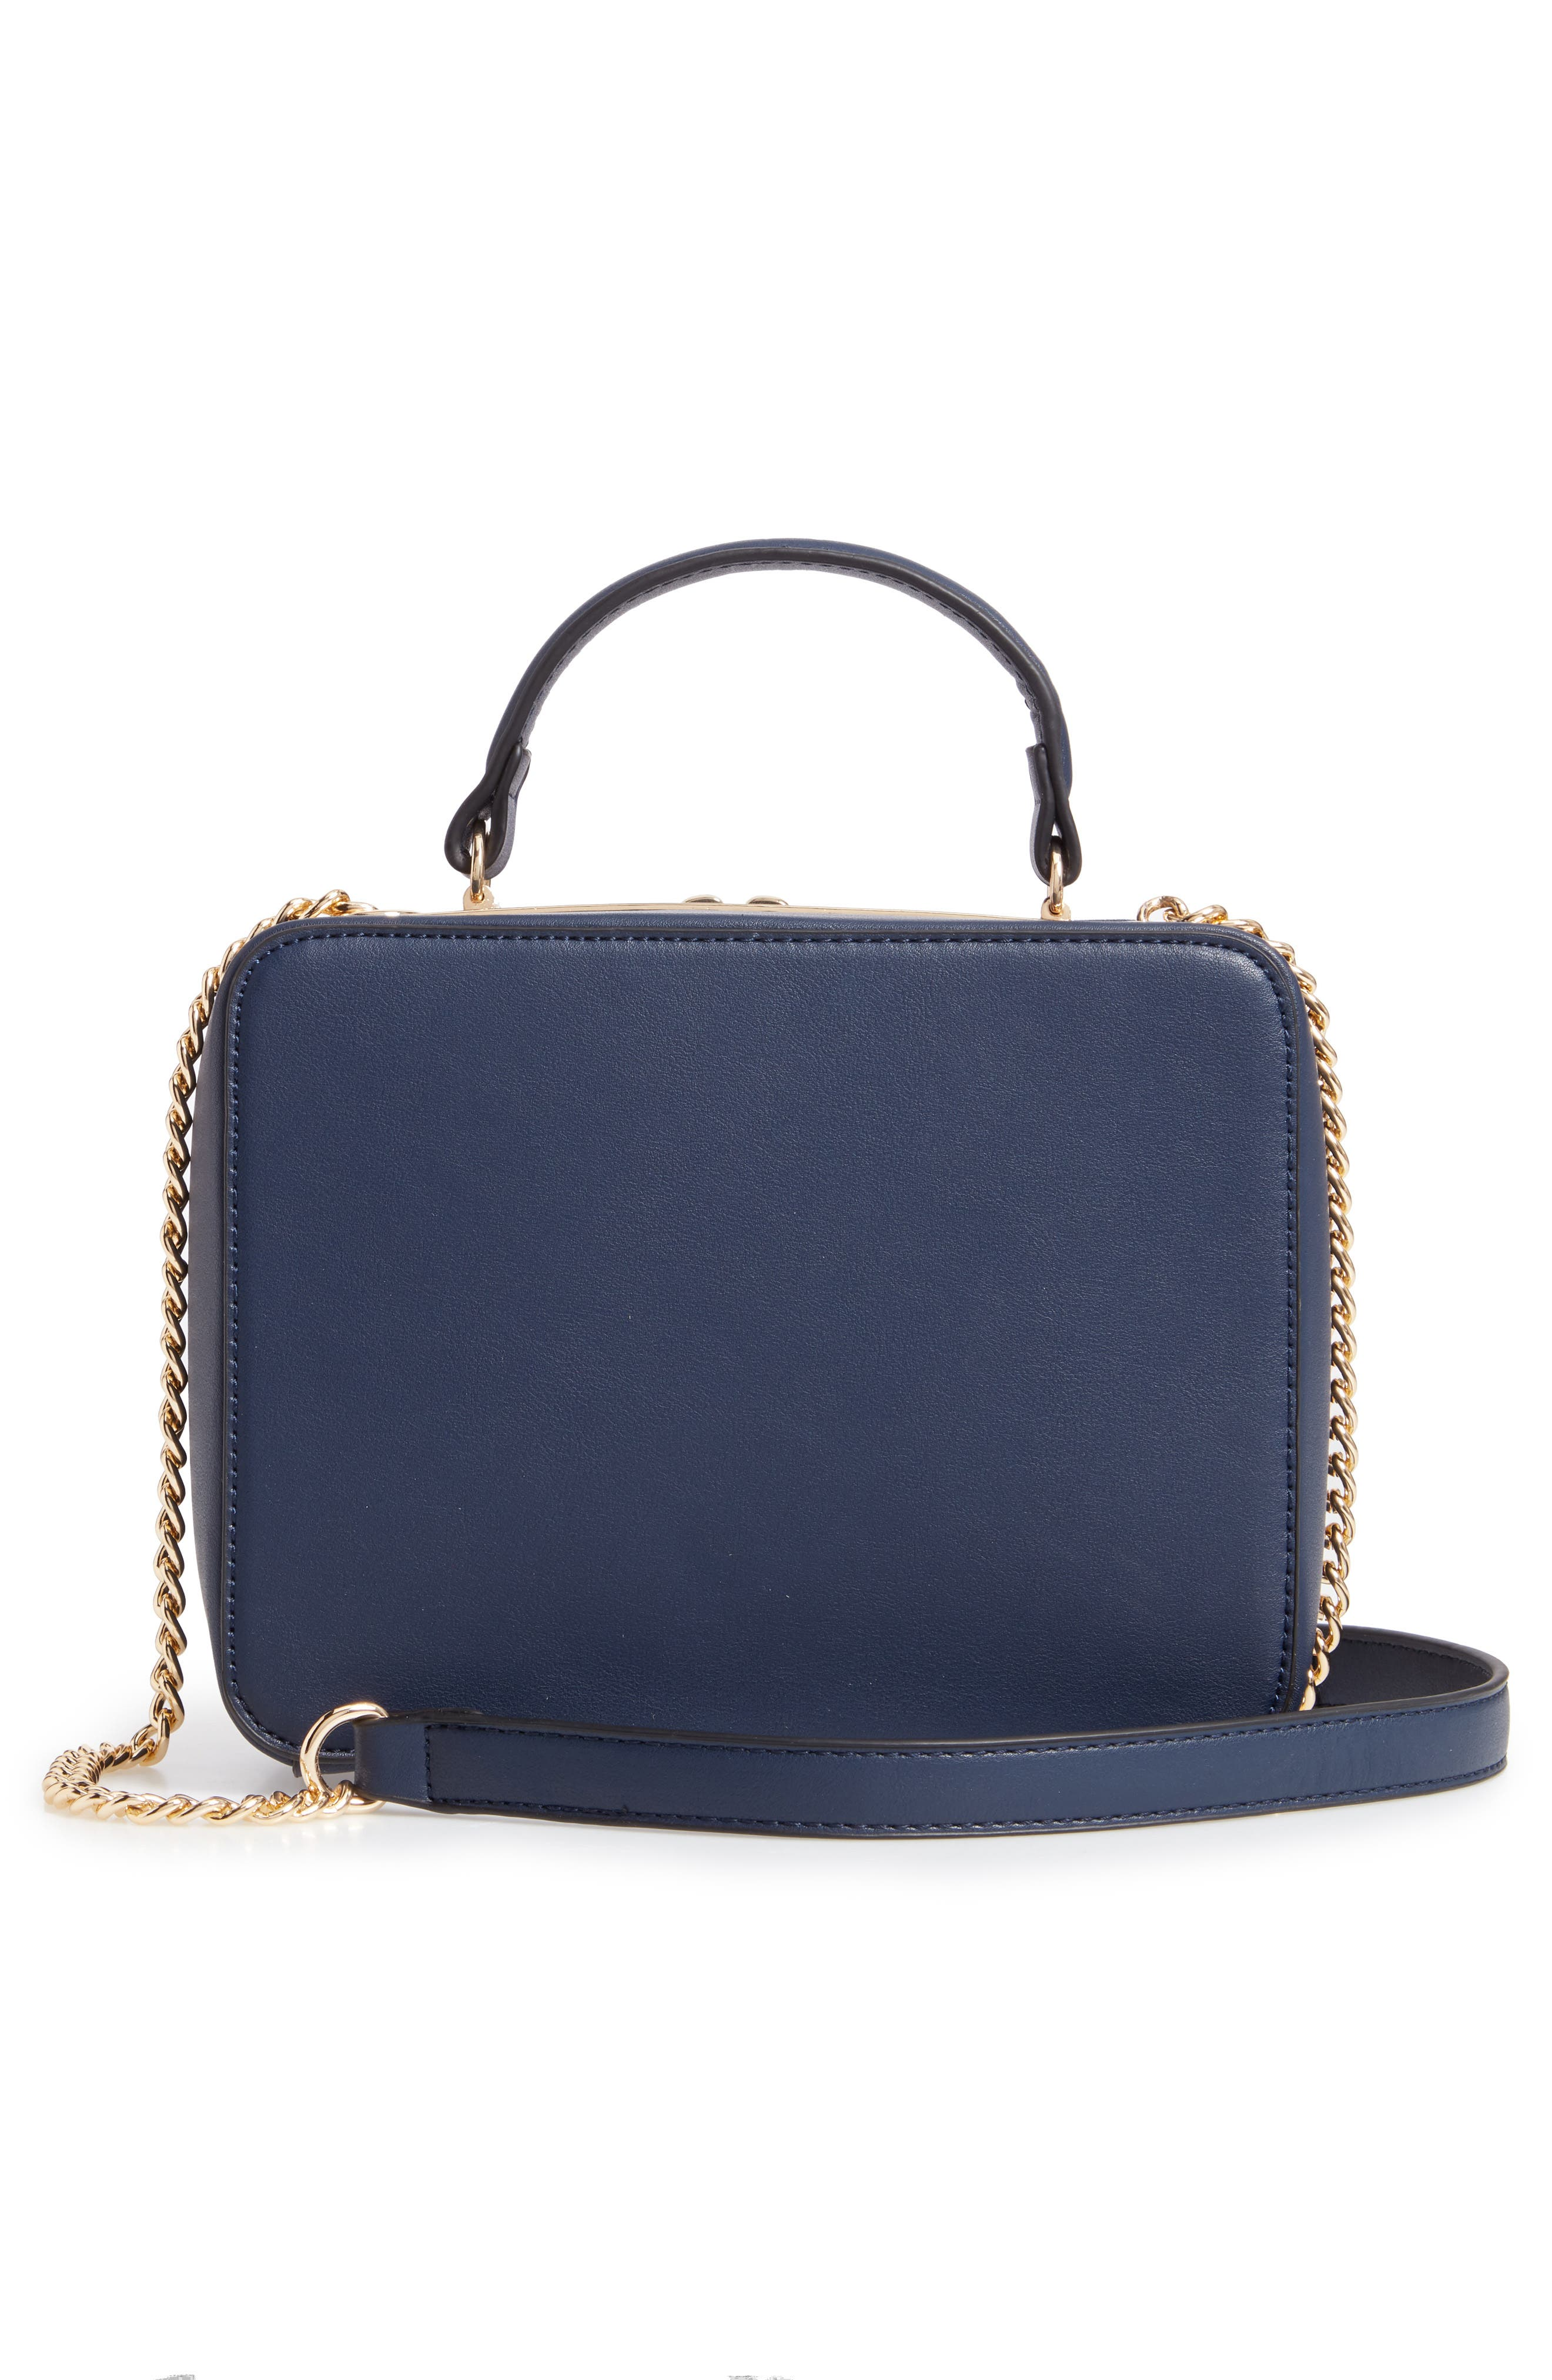 Grommet Detail Faux Leather Crossbody Bag,                             Alternate thumbnail 3, color,                             400